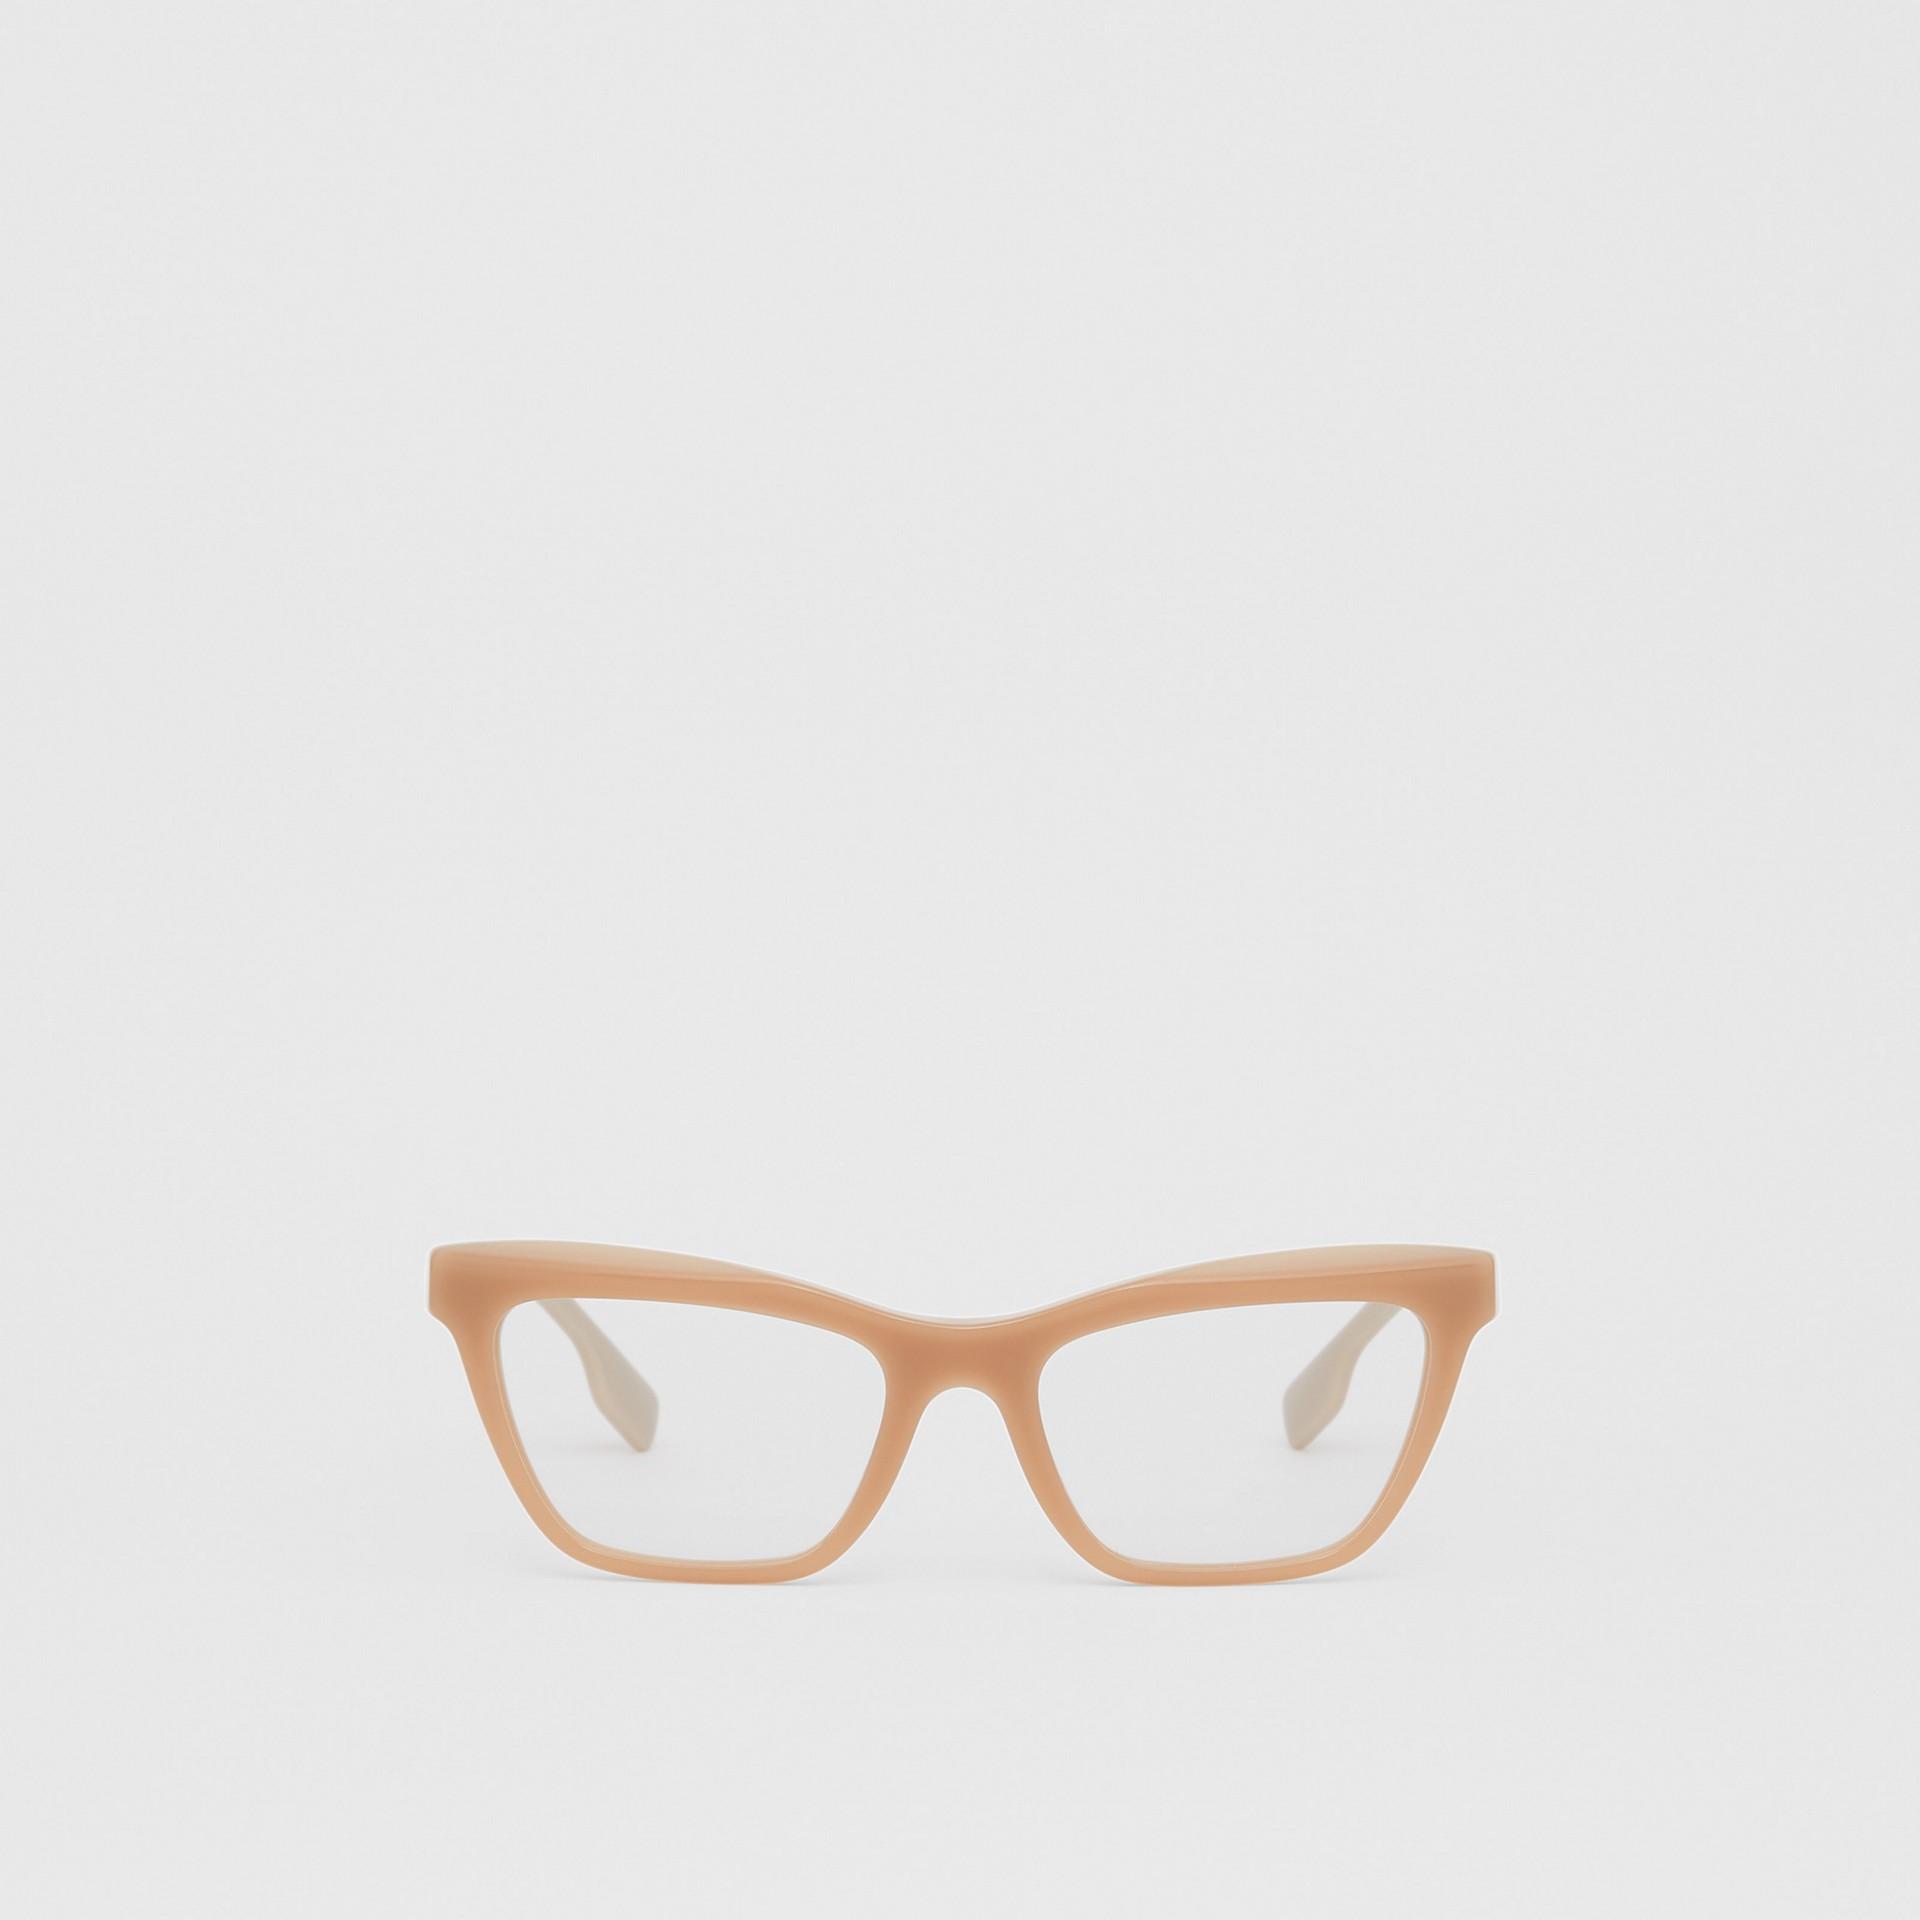 Rectangular Optical Frames in Peach - Women | Burberry Australia - gallery image 0